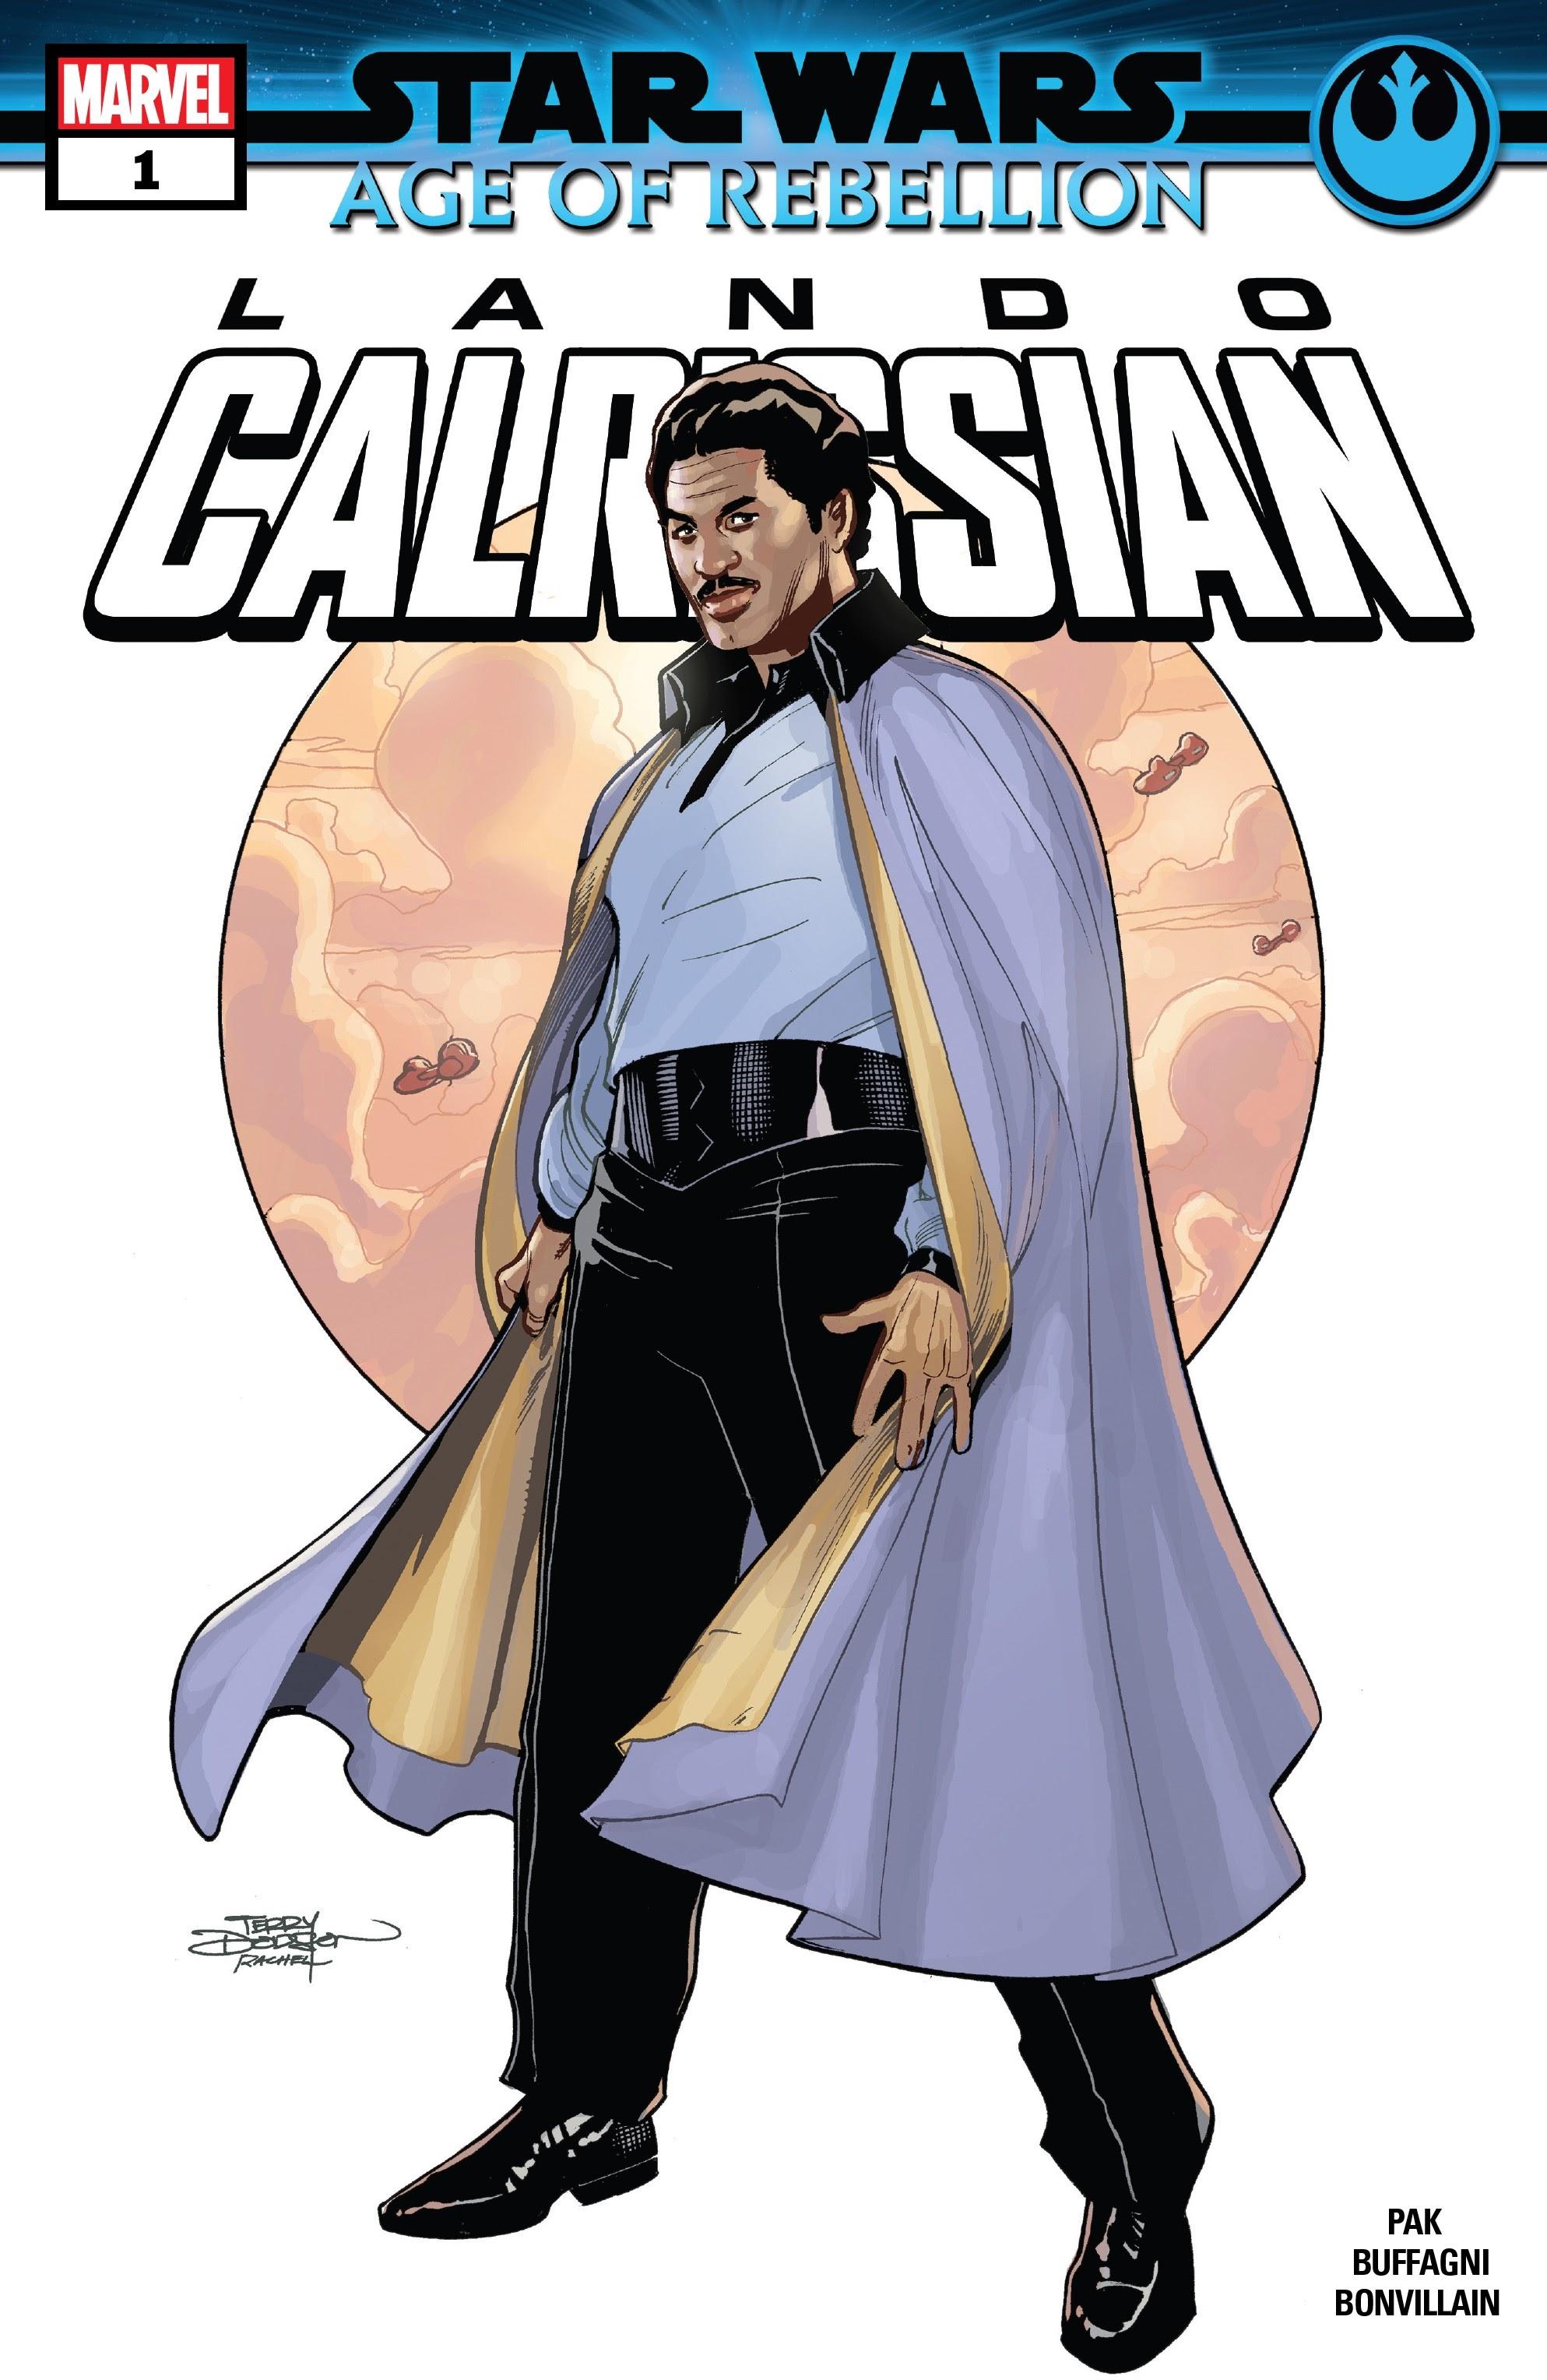 Star Wars: Age Of Rebellion Lando_Calrissian Page 1